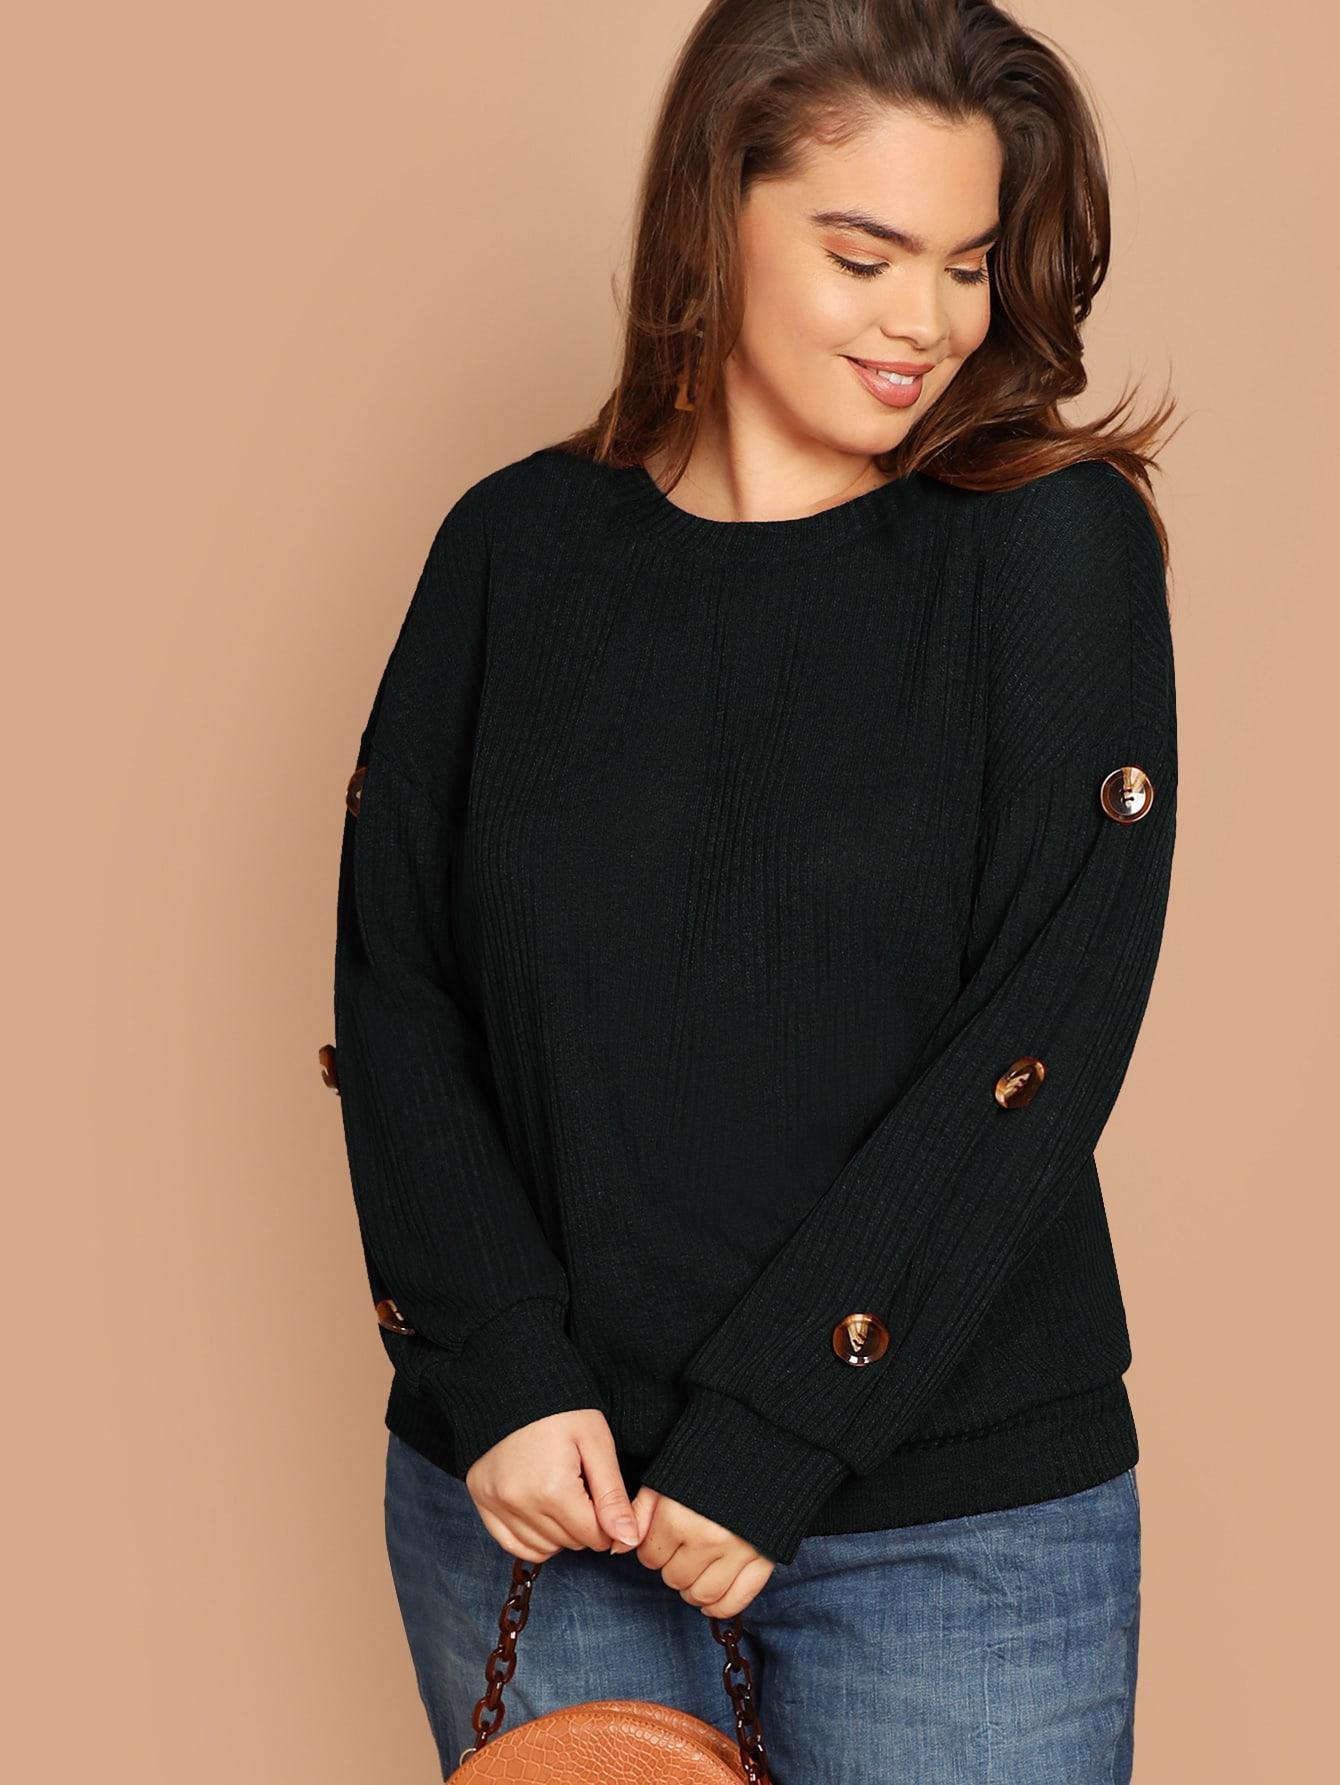 Купить Размера плюс вязяная ребристая футболка с пуговицами на рукавах, Faith Bowman, SheIn